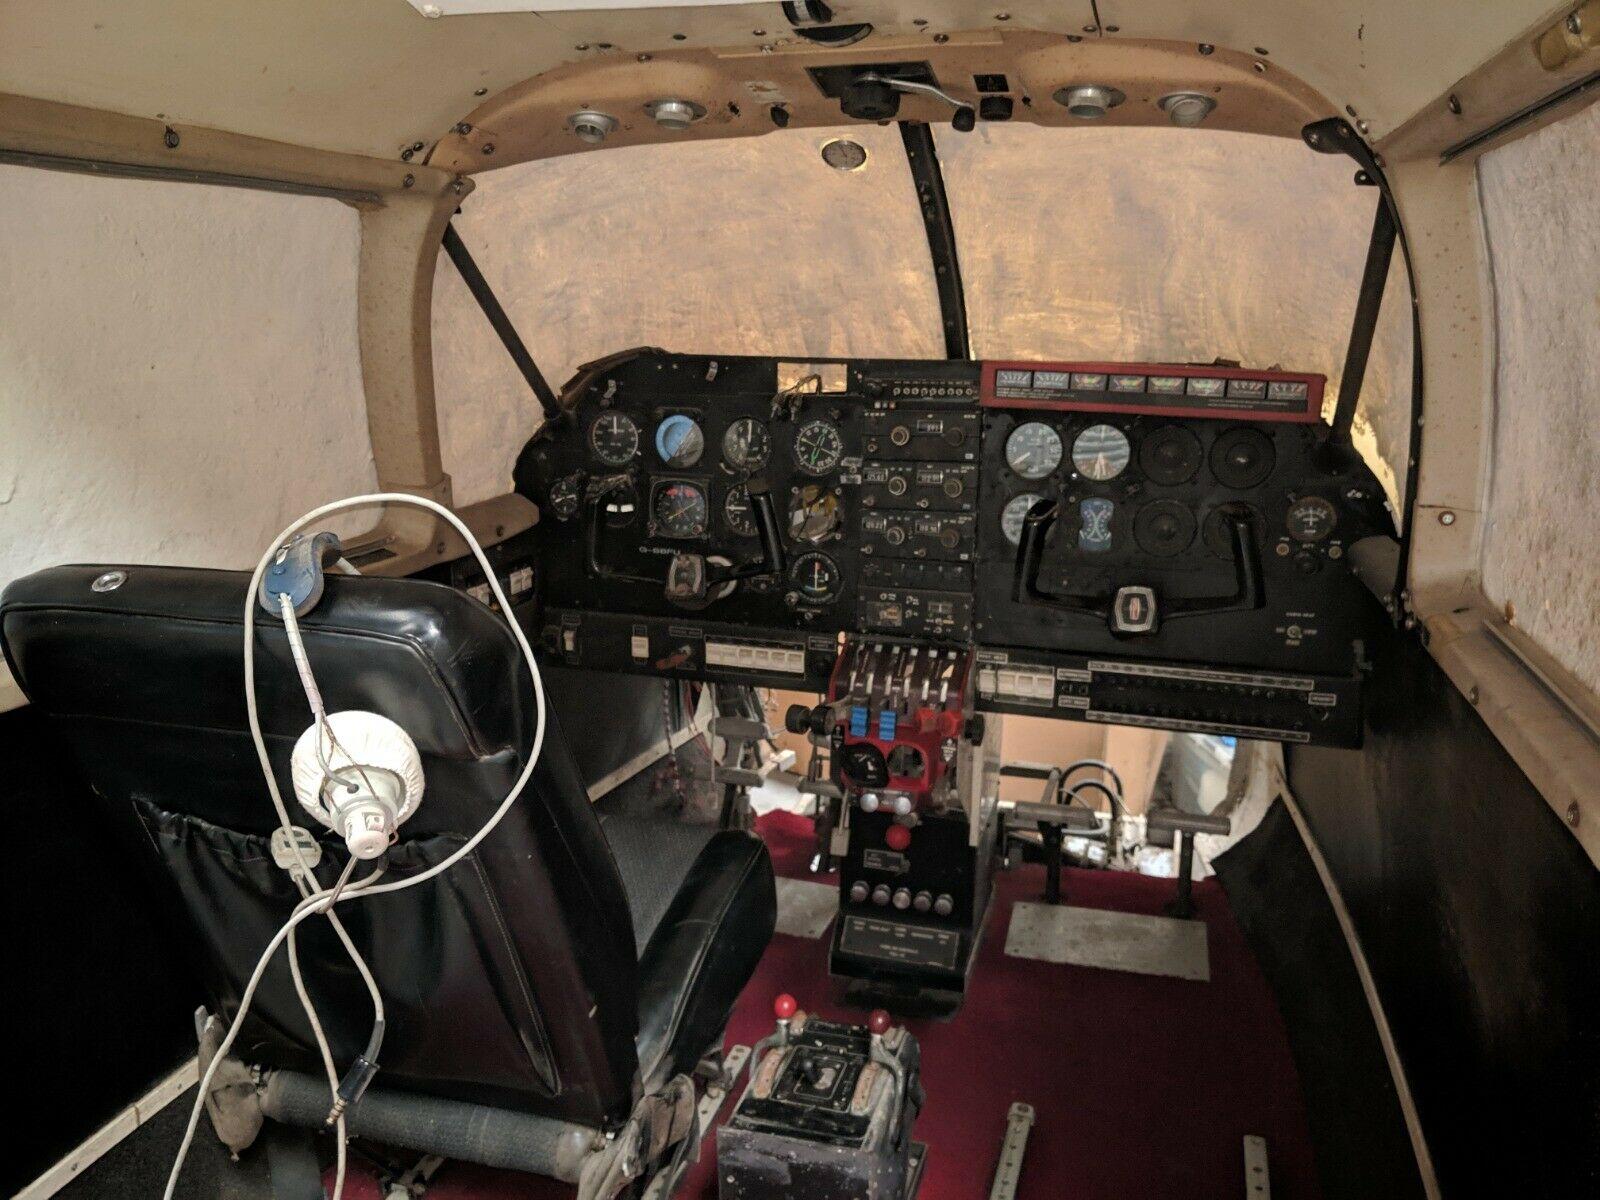 Posts by Jay 737 - IPACS Aerofly Forum